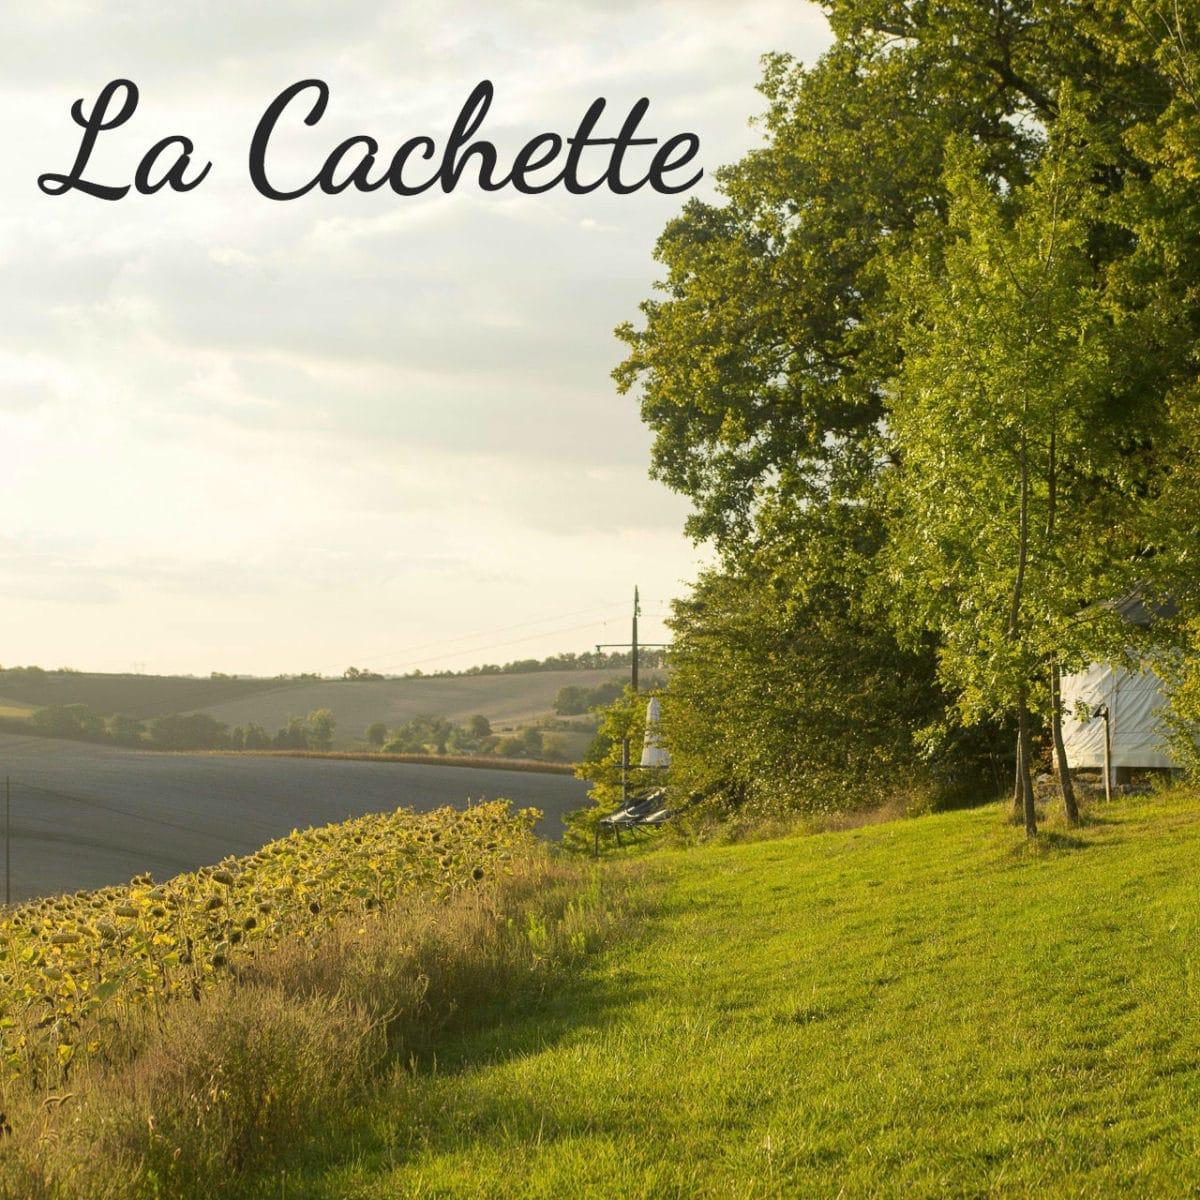 La Cachette page